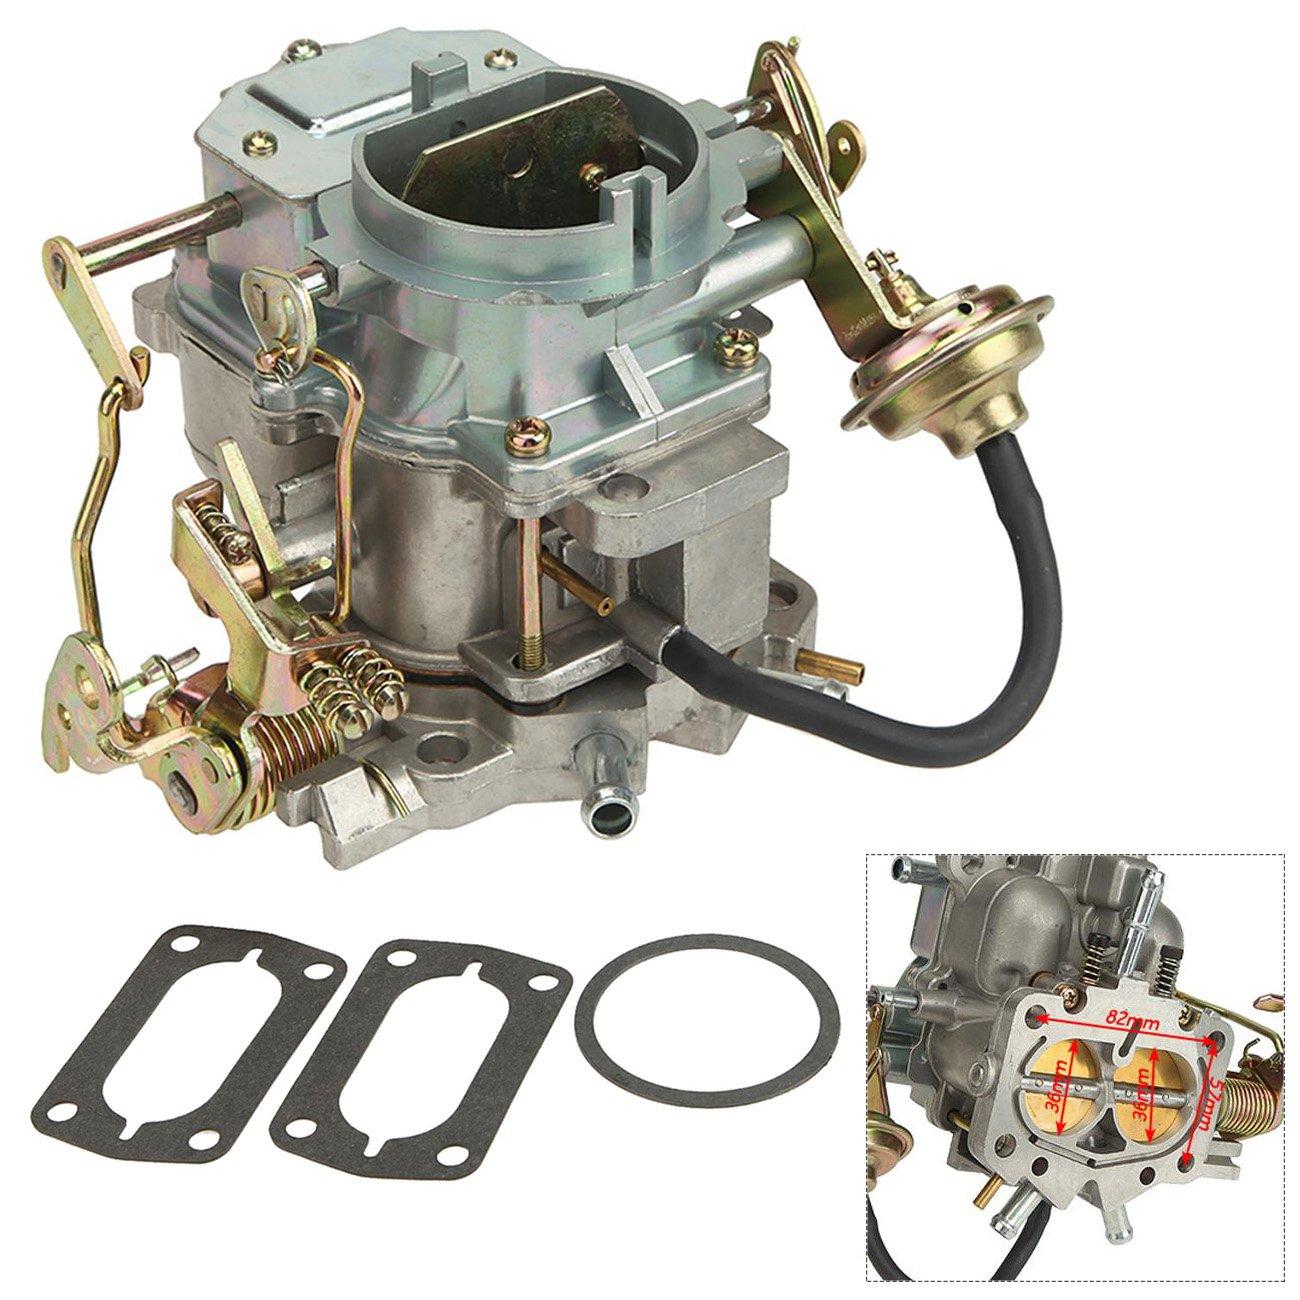 Amazon.com: ALAVENTE Carburetor Carb for Dodge Plymouth Models & Dodge  Truck 1966-1973 with 273-318 Engine(Manual Choke): Automotive